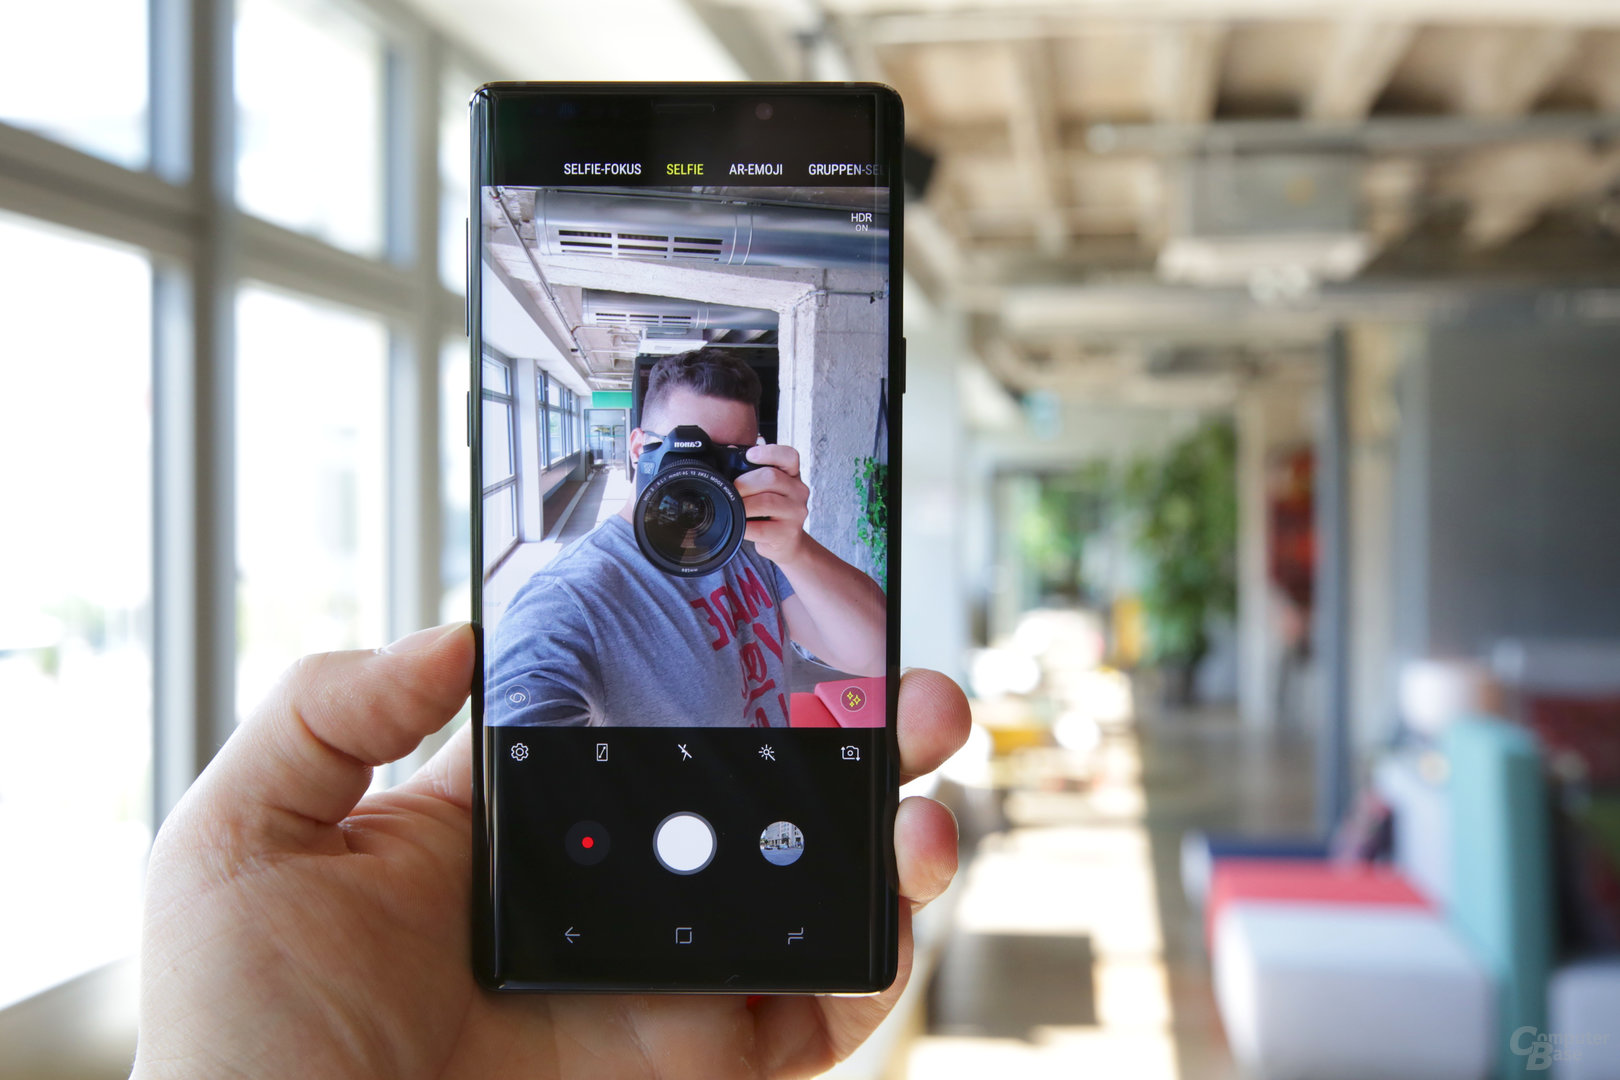 Kamera im Selfie-Modus